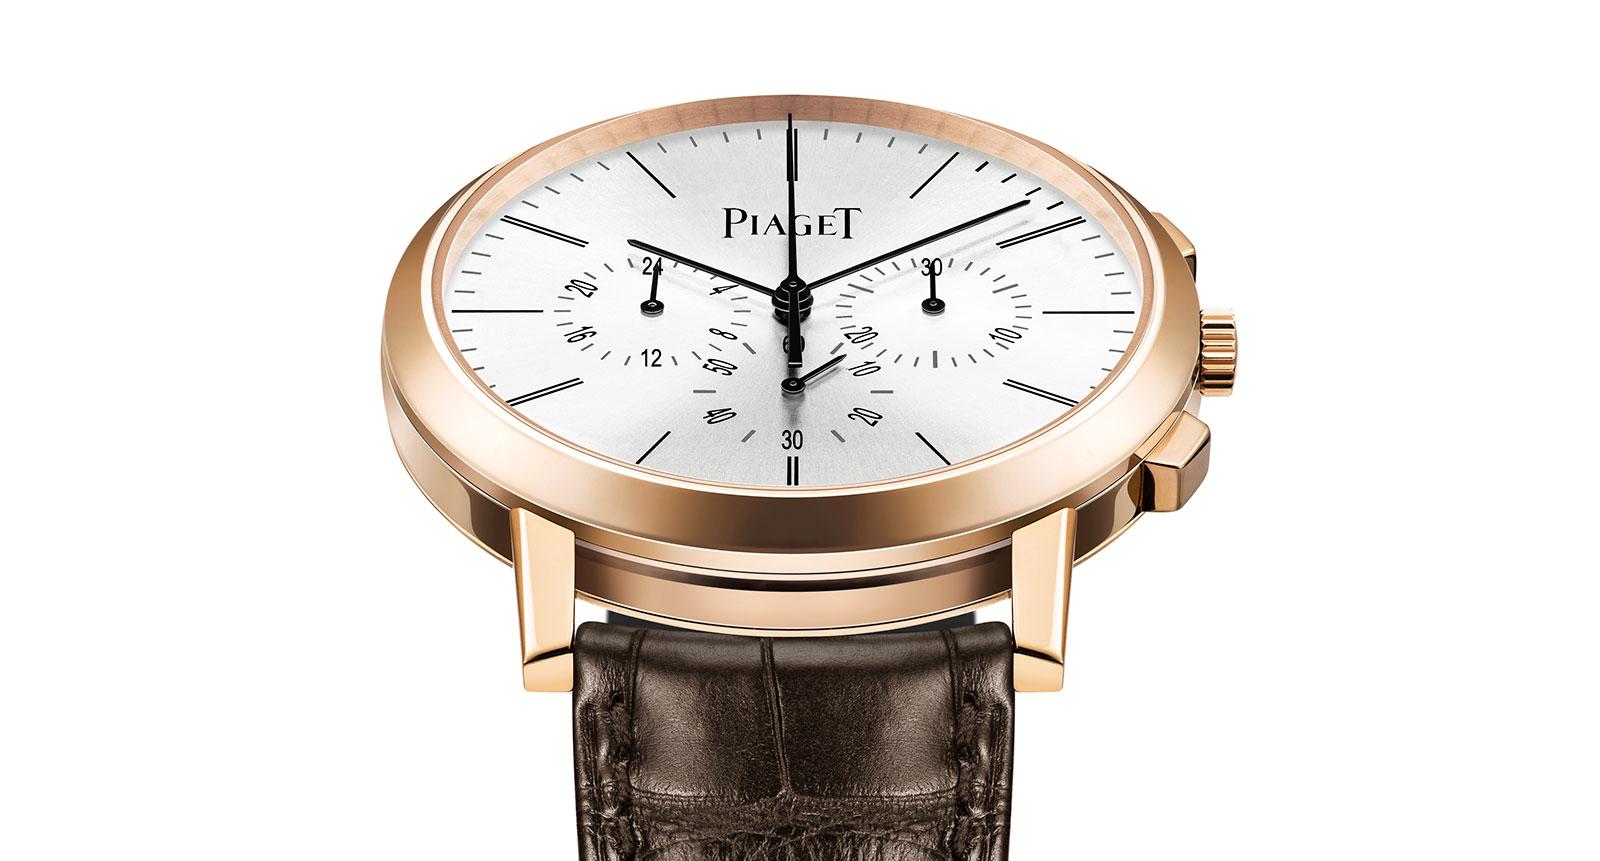 Piaget-Altiplano-Chronograph-1